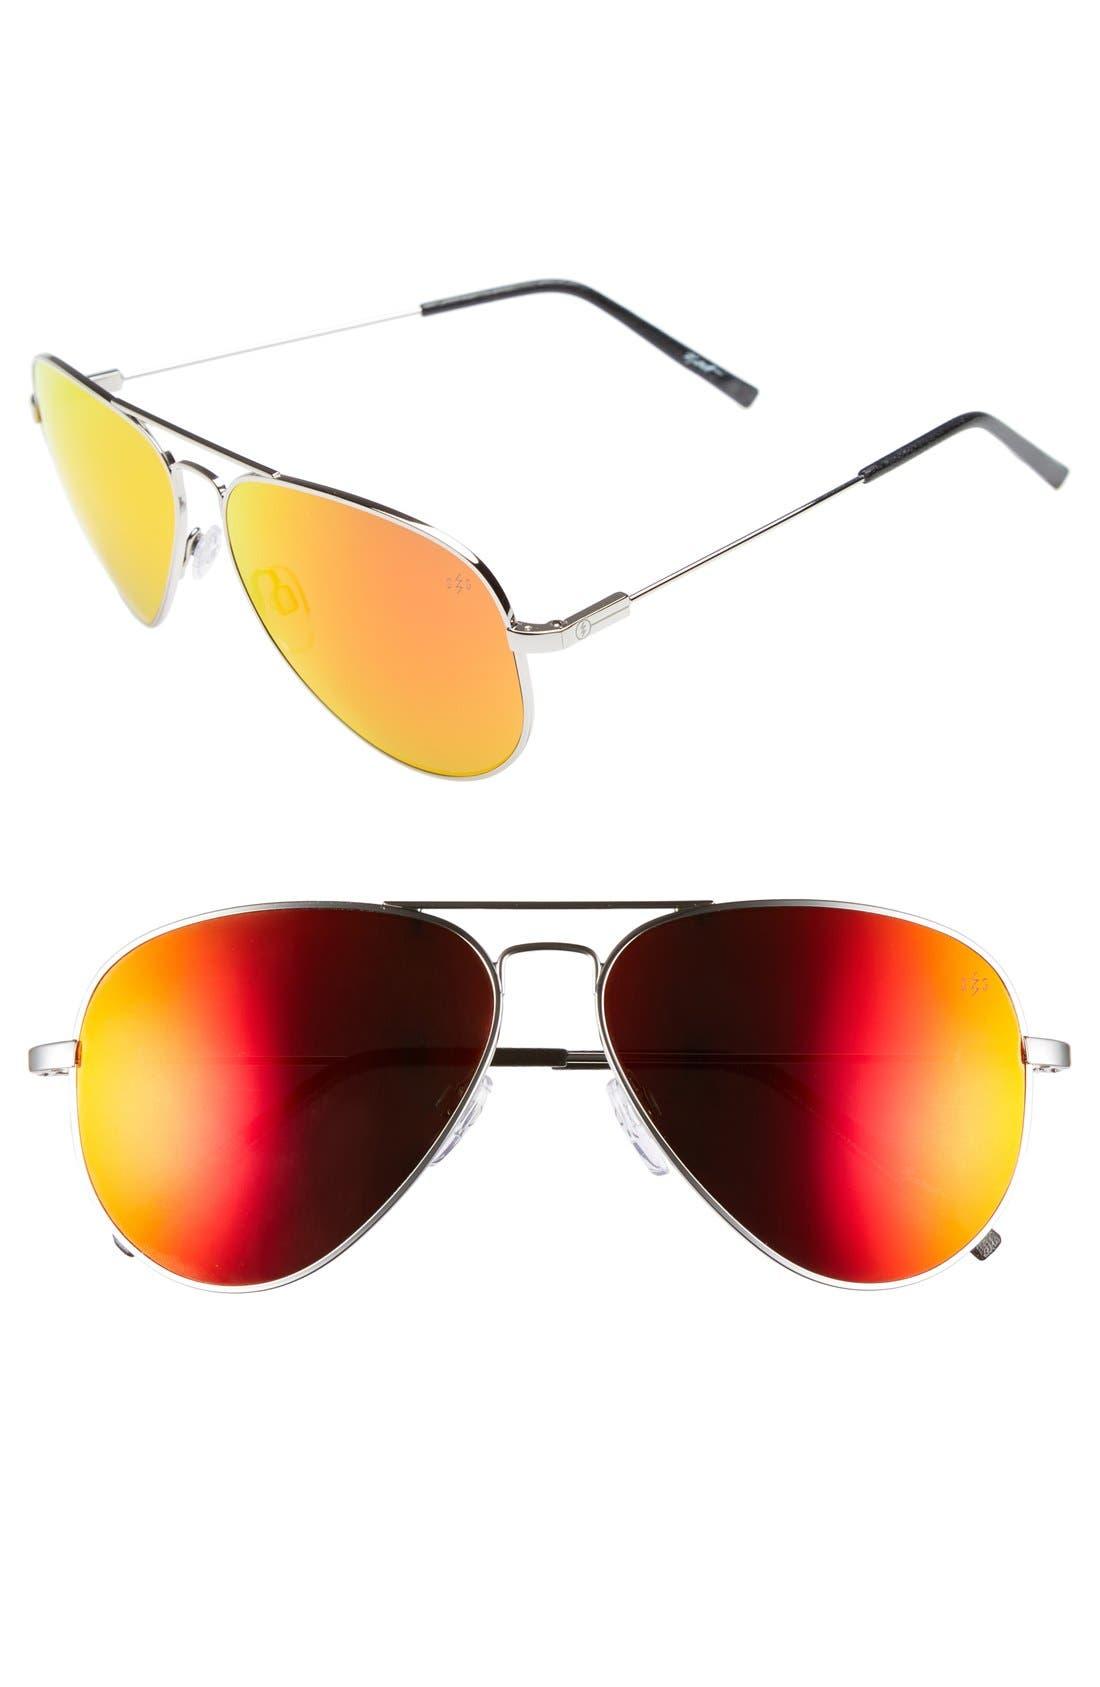 Main Image - ELECTRIC 'AV1 Large'58mm Aviator Sunglasses